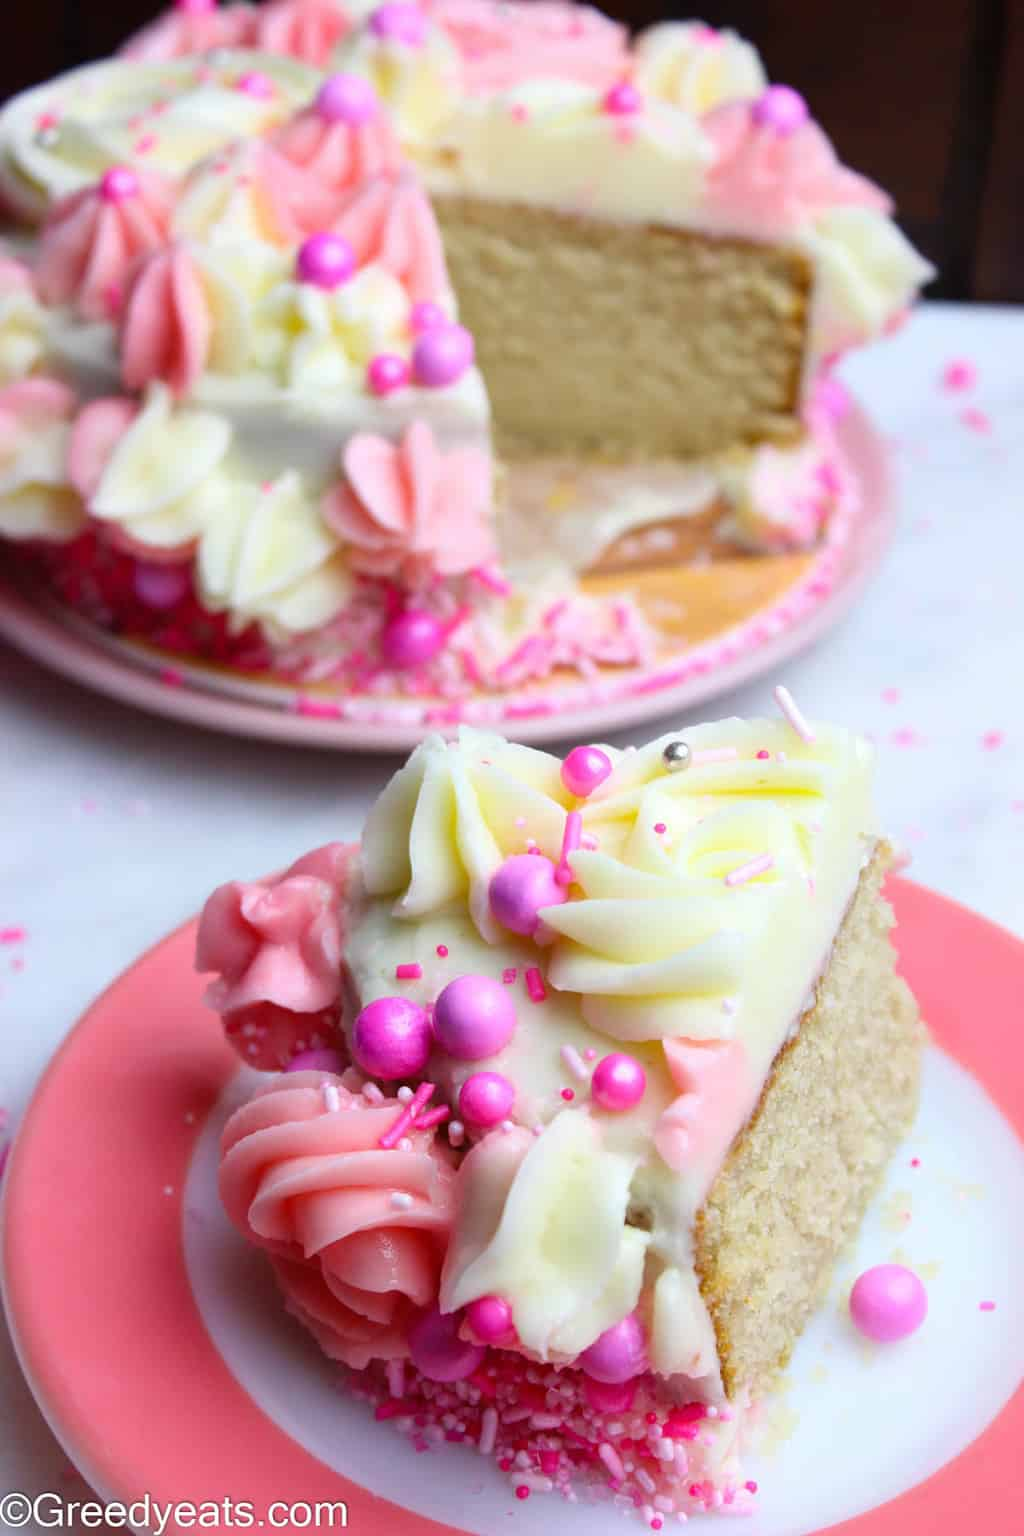 Easy vanilla cake slice with creamy white and pink vanilla buttercream frosting recipe on Greedyeats.com